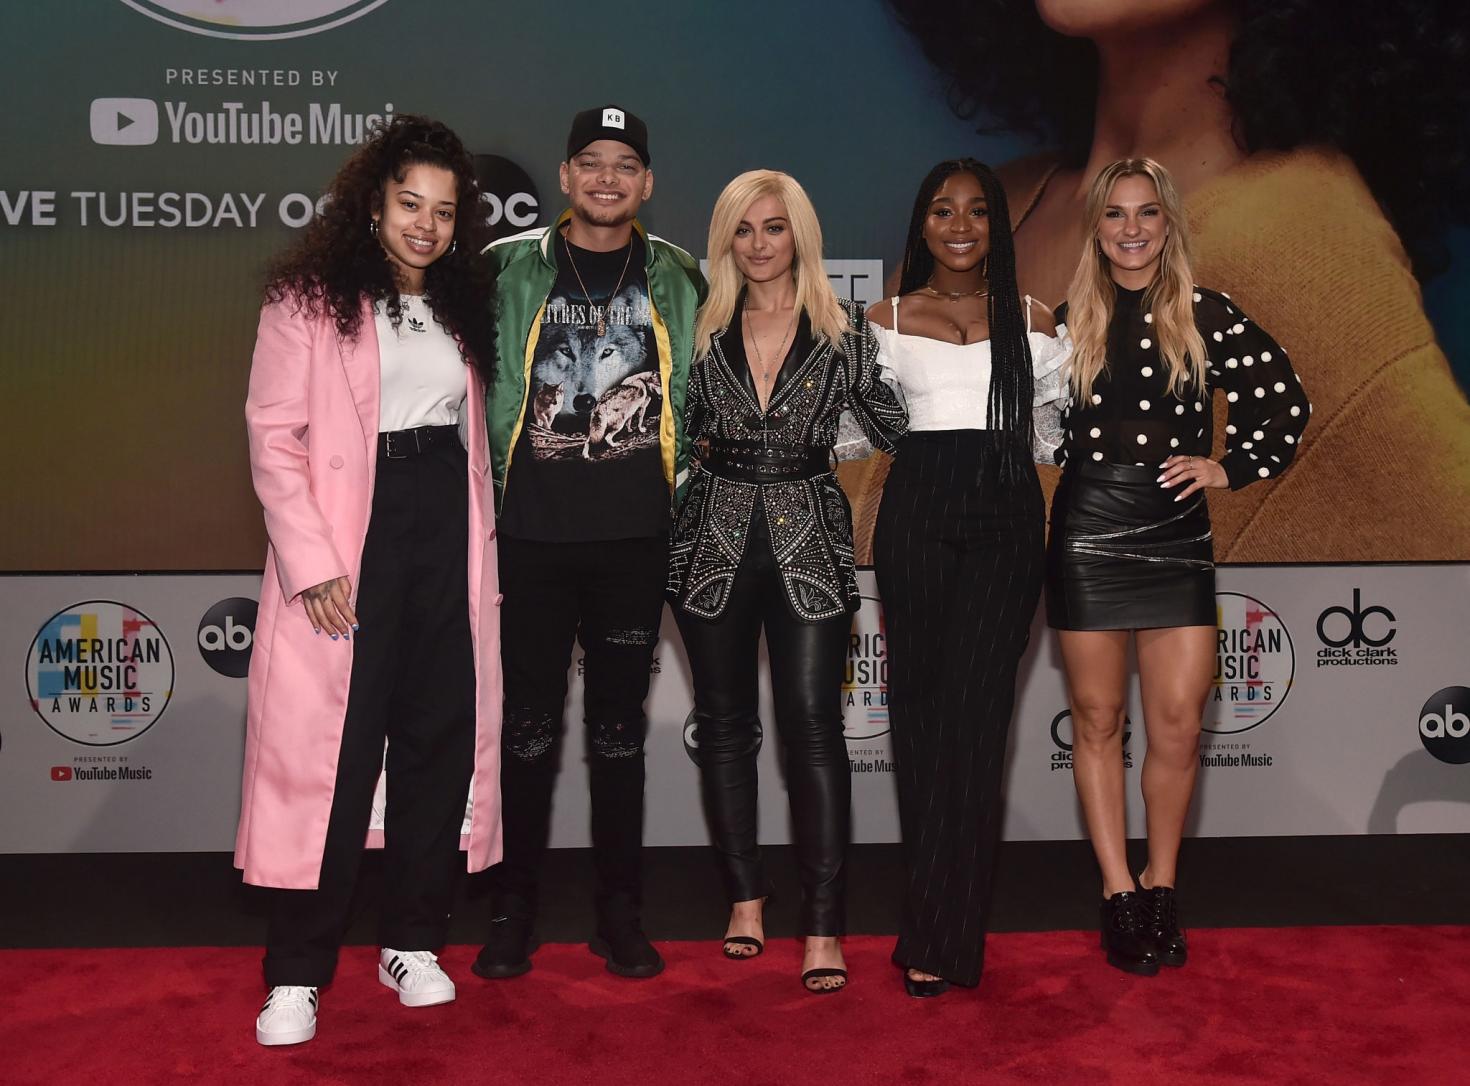 Bebe Rexha 2018 : Bebe Rexha: 2018 American Music Awards Nominations Announcement -03